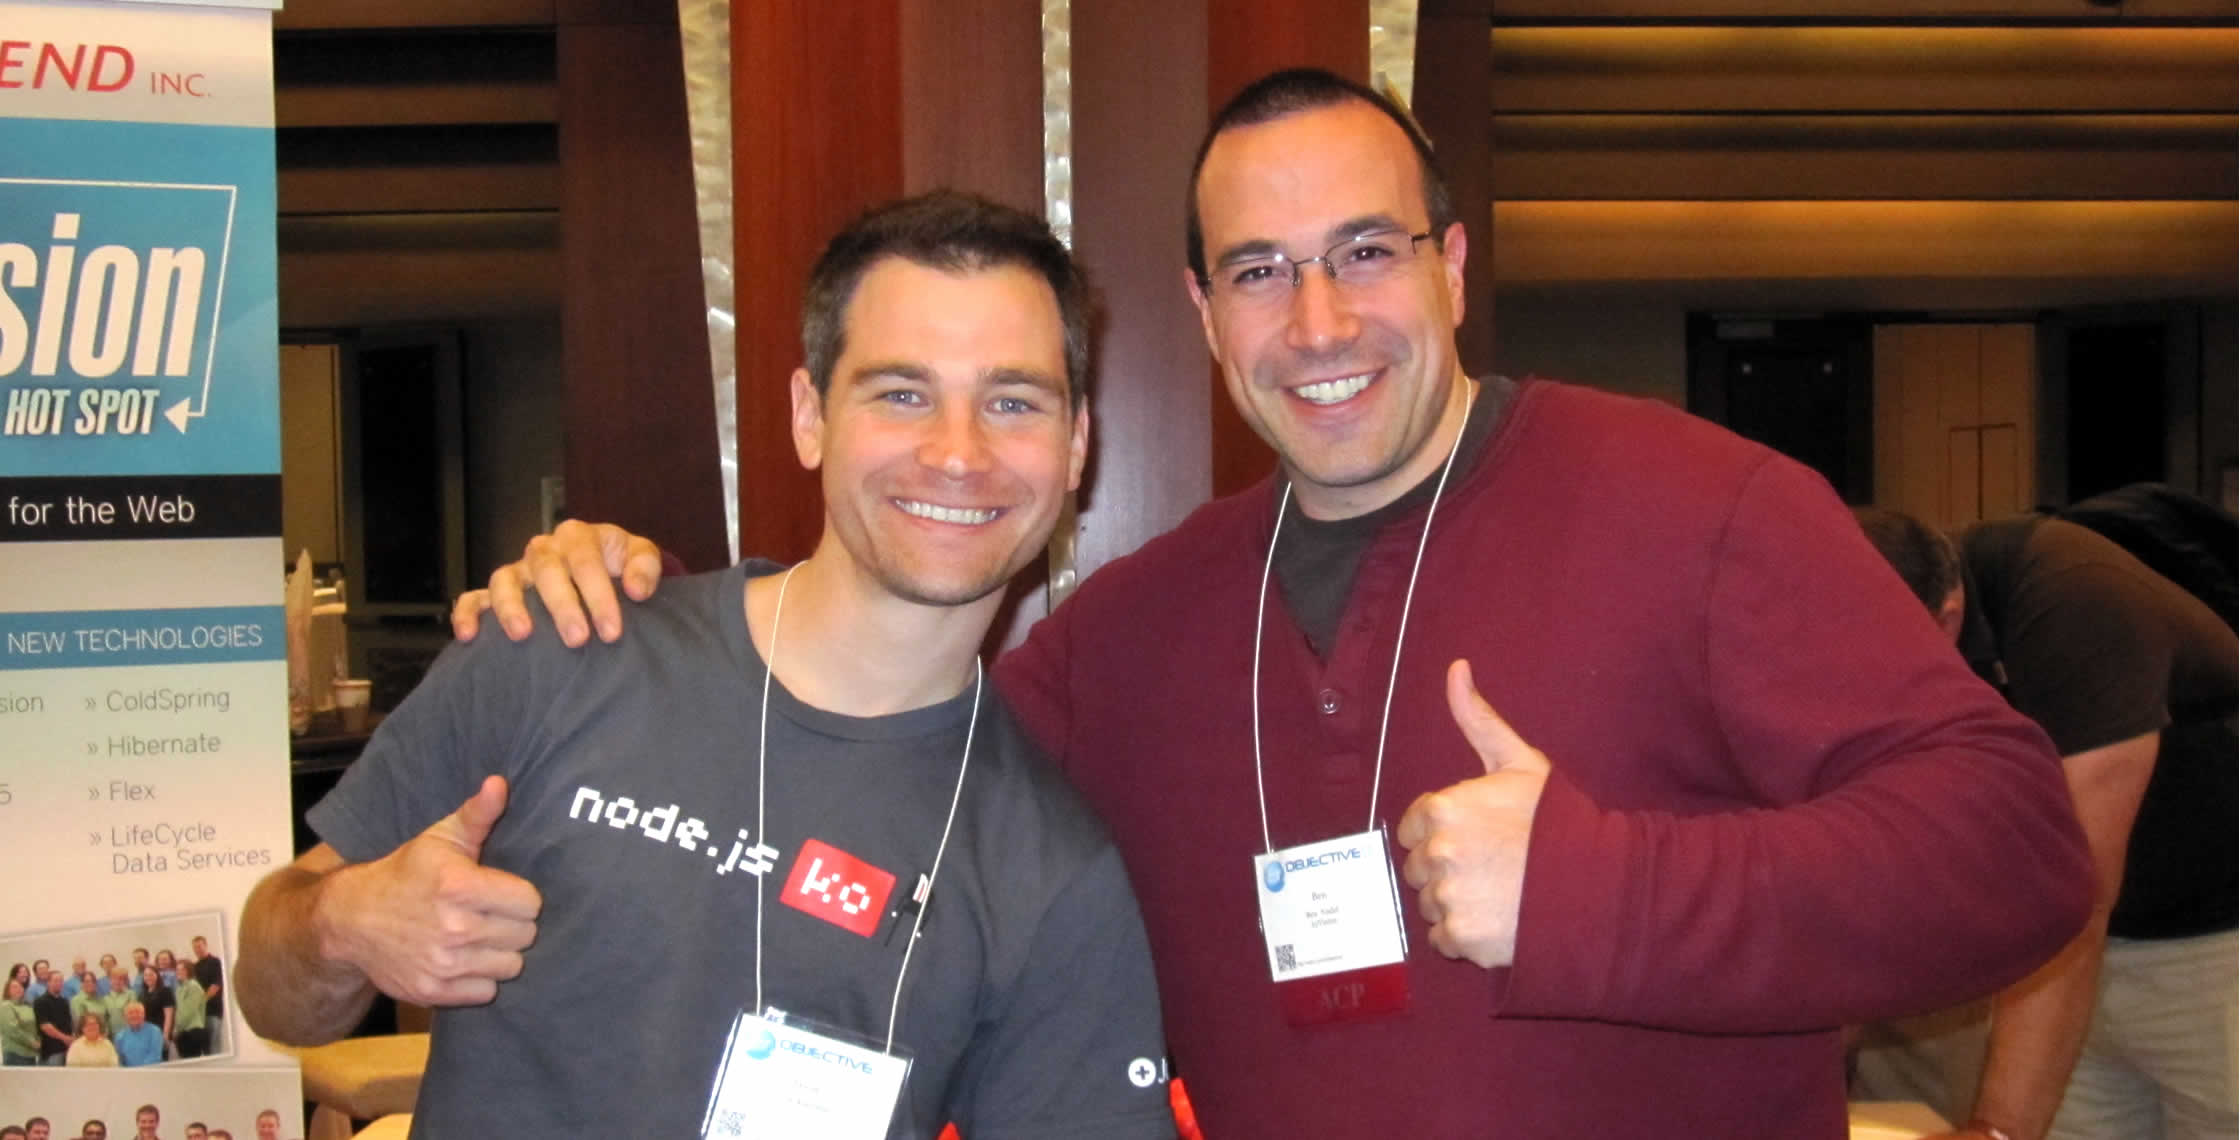 Ben Nadel at cf.Objective() 2012 (Minneapolis, MN) with: Jason Kadrmas